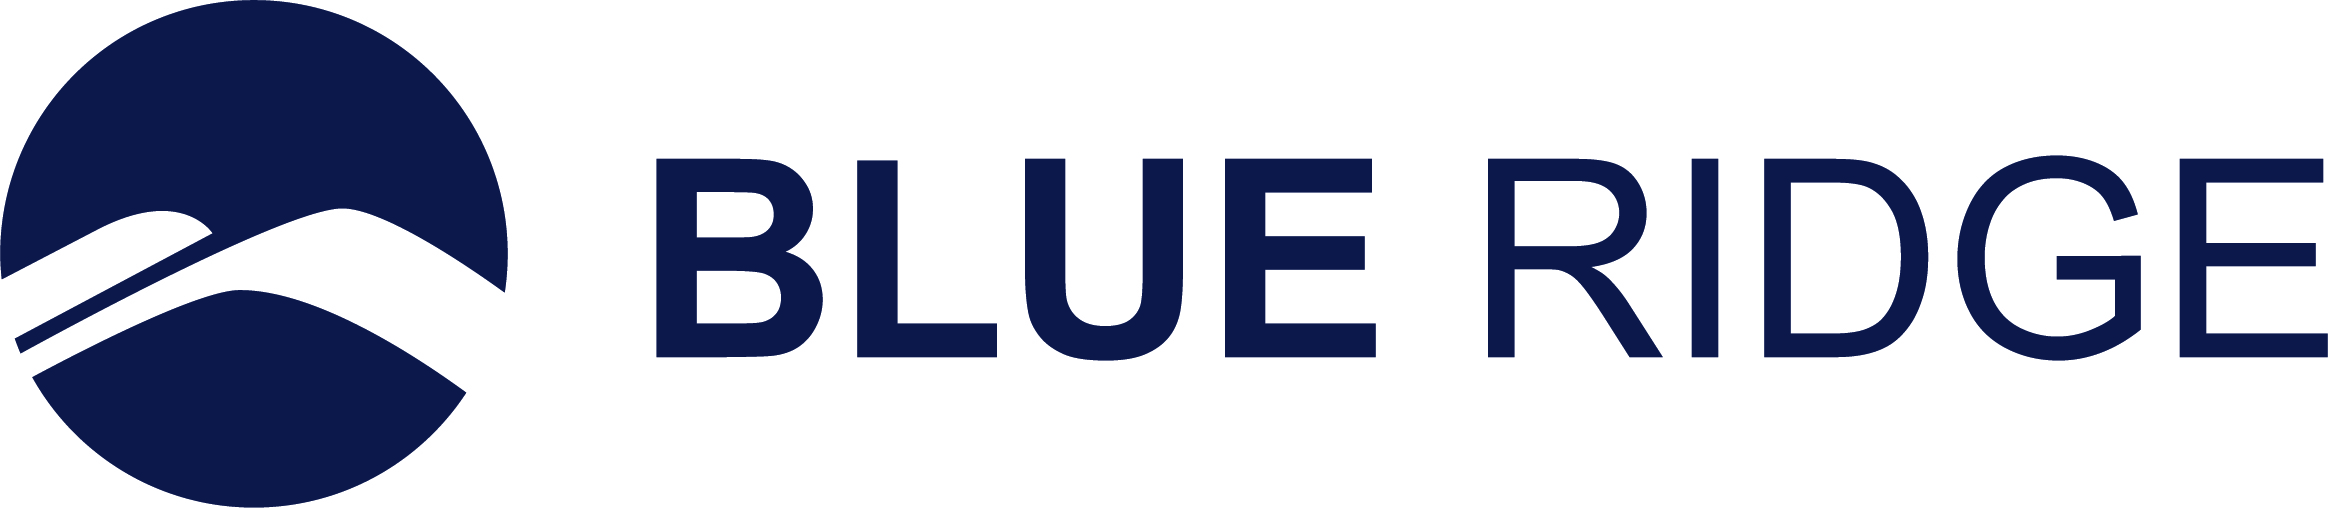 Blue Ridge and UniPro Webinar on Rethinking Food Distribution